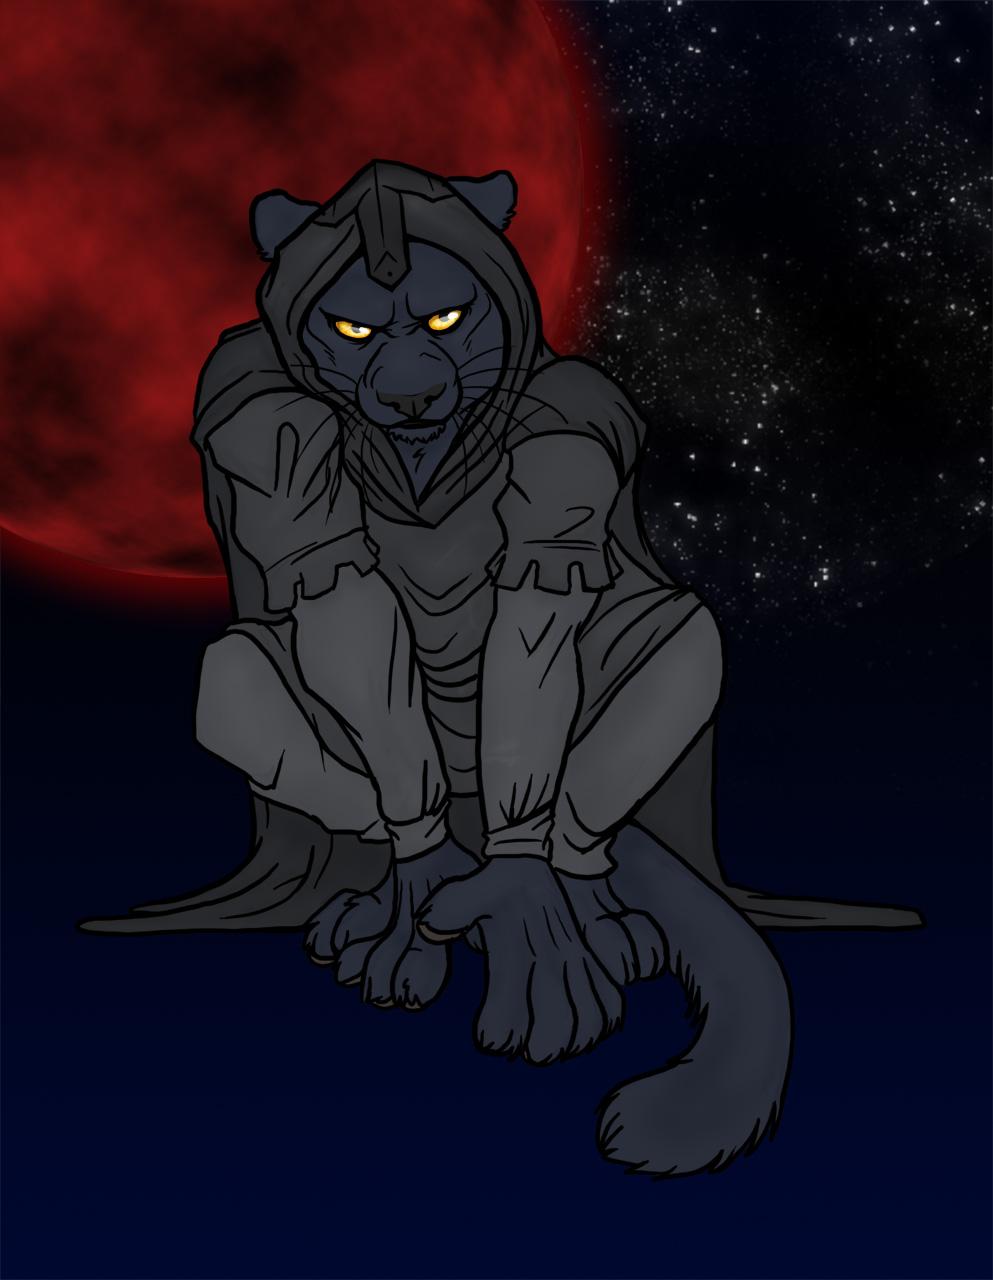 The Night-Stalker